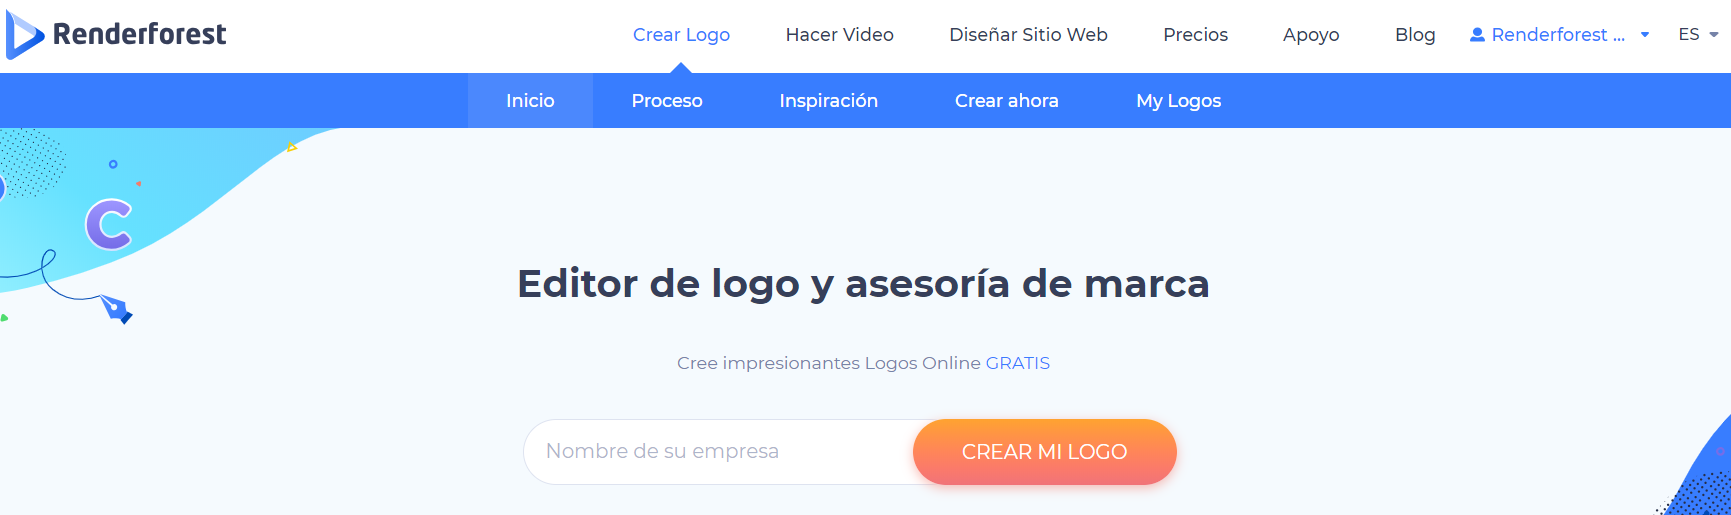 Renderforest logo maker